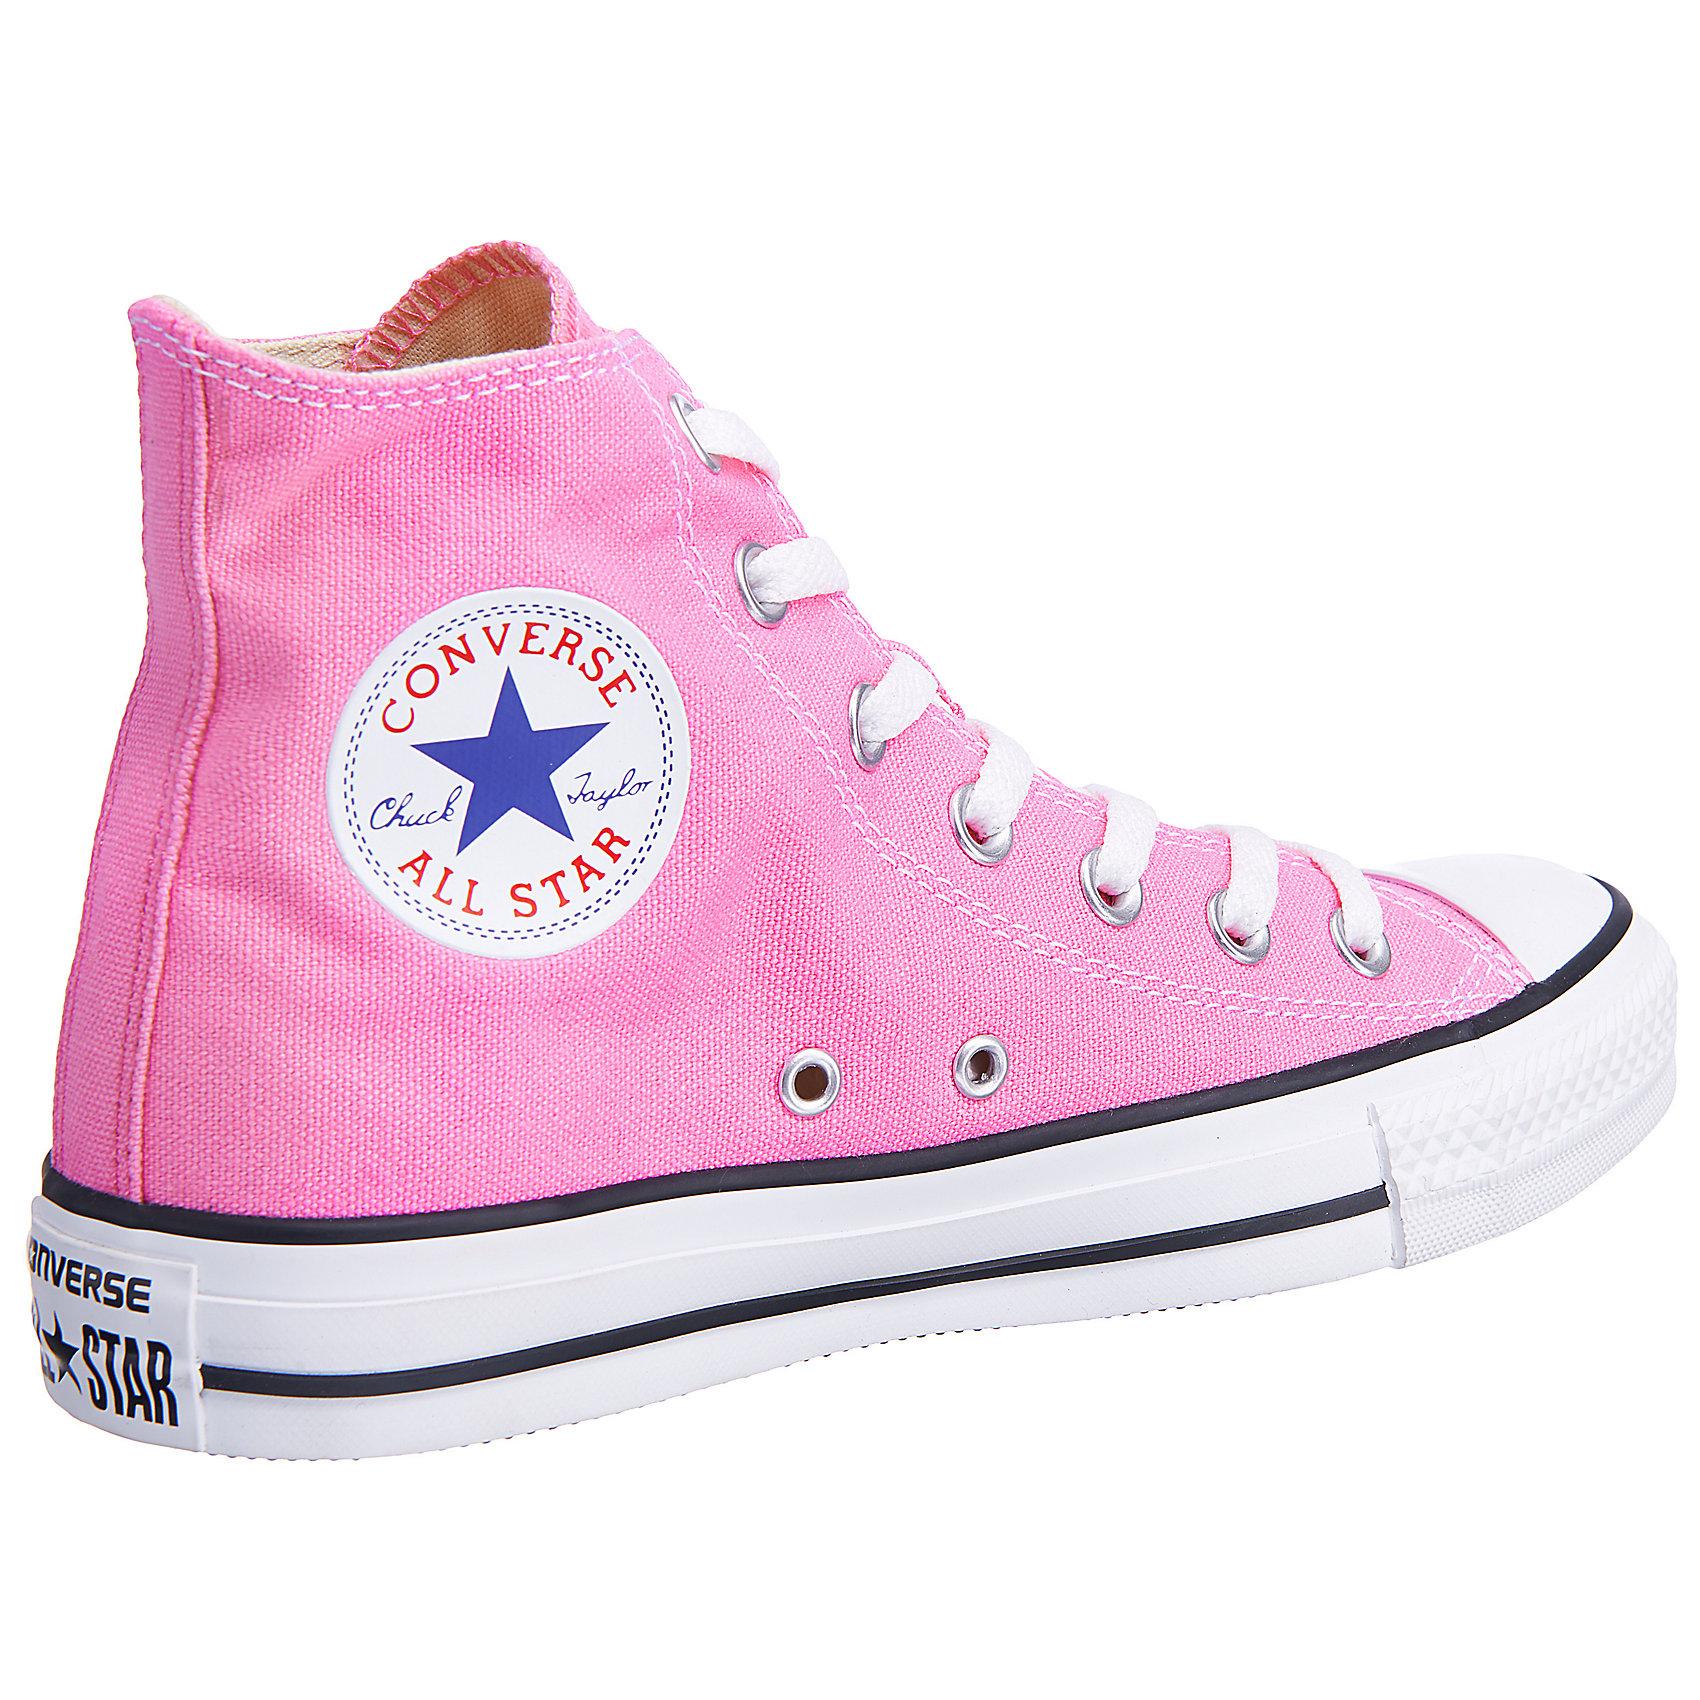 Neu CONVERSE Chuck Taylor All Star High Sneakers 5703260 für Damen rosa